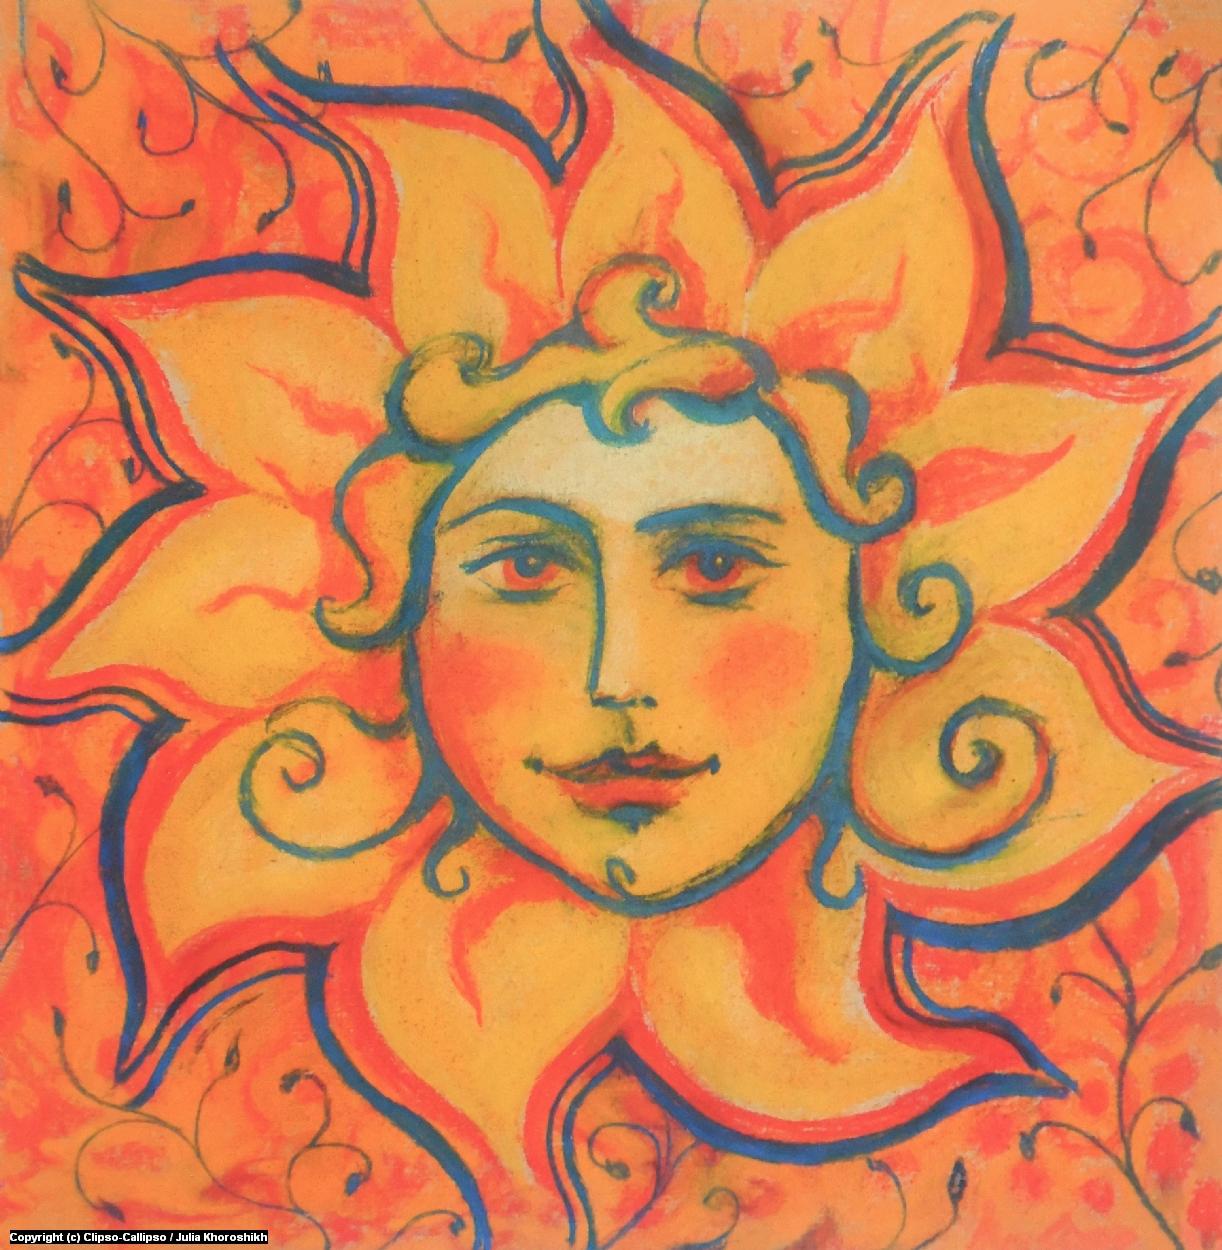 The Sun Artwork by Julia Khoroshikh